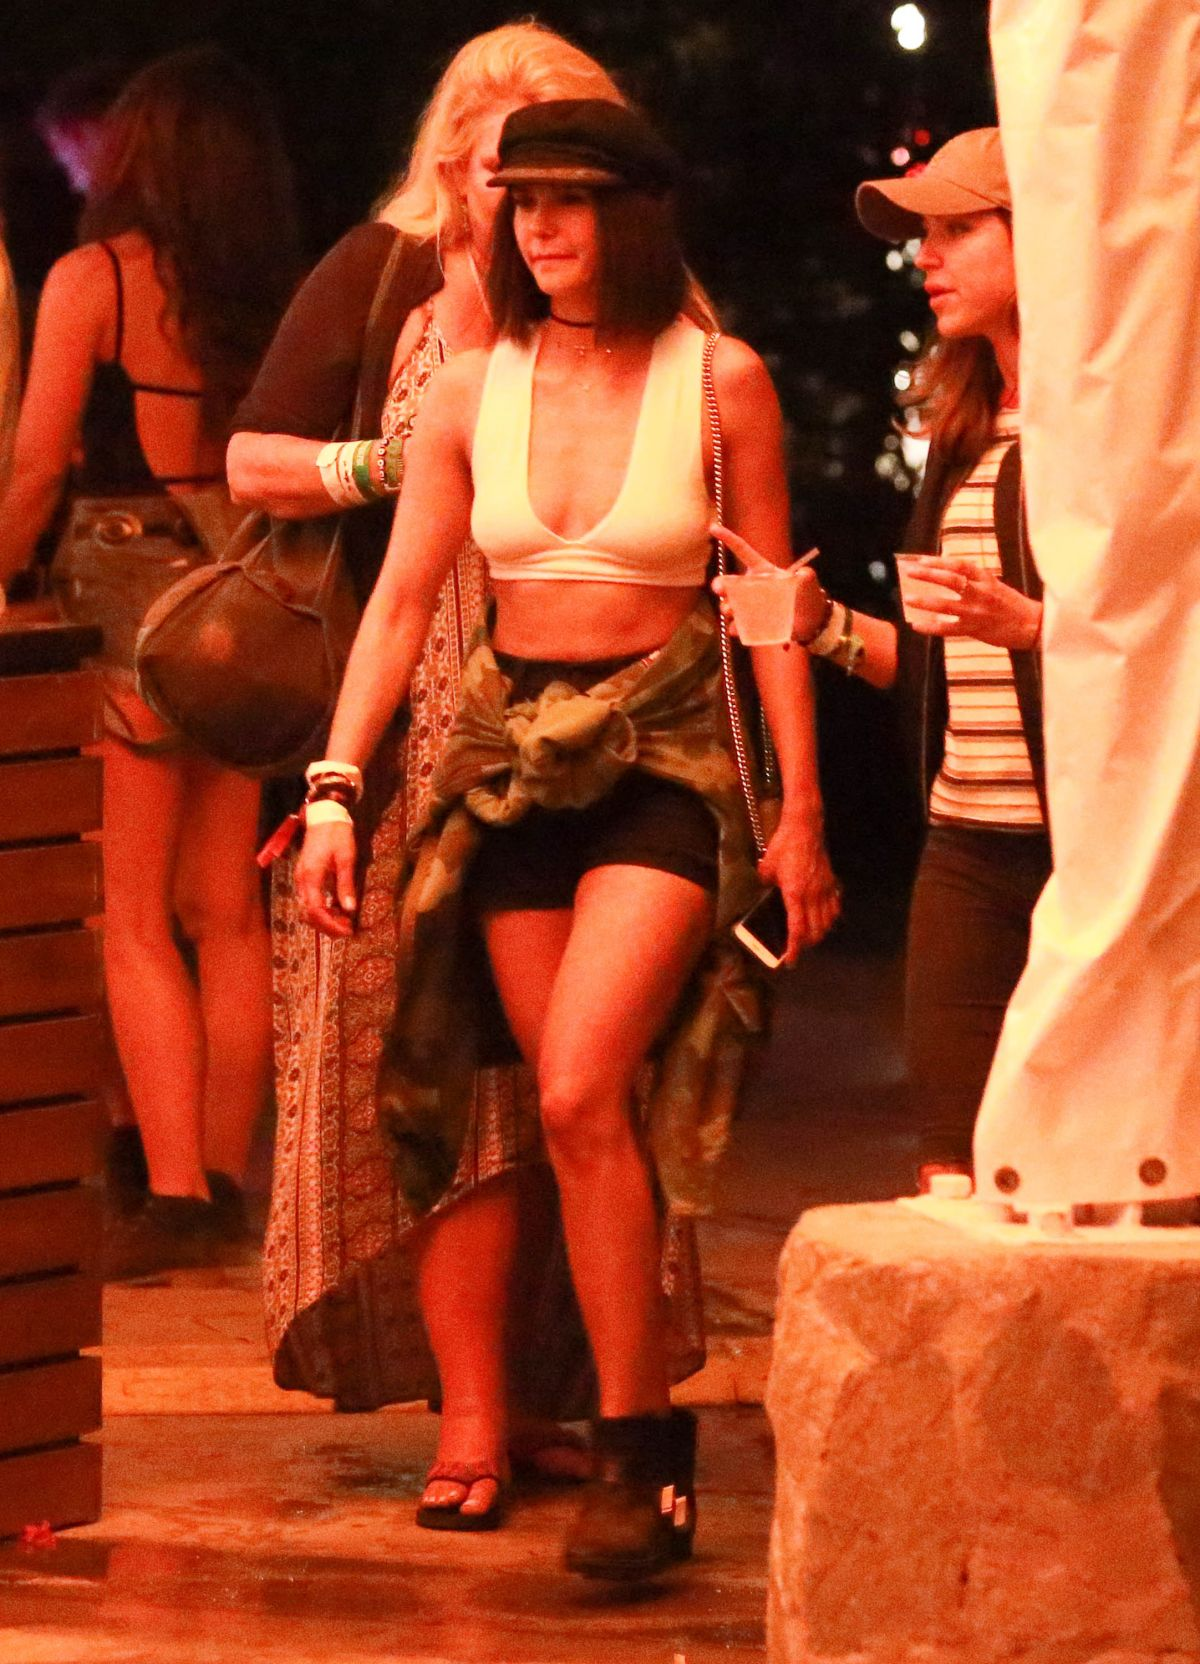 NINA DOBREV at Coachella Festival in Indio 04/14/2017